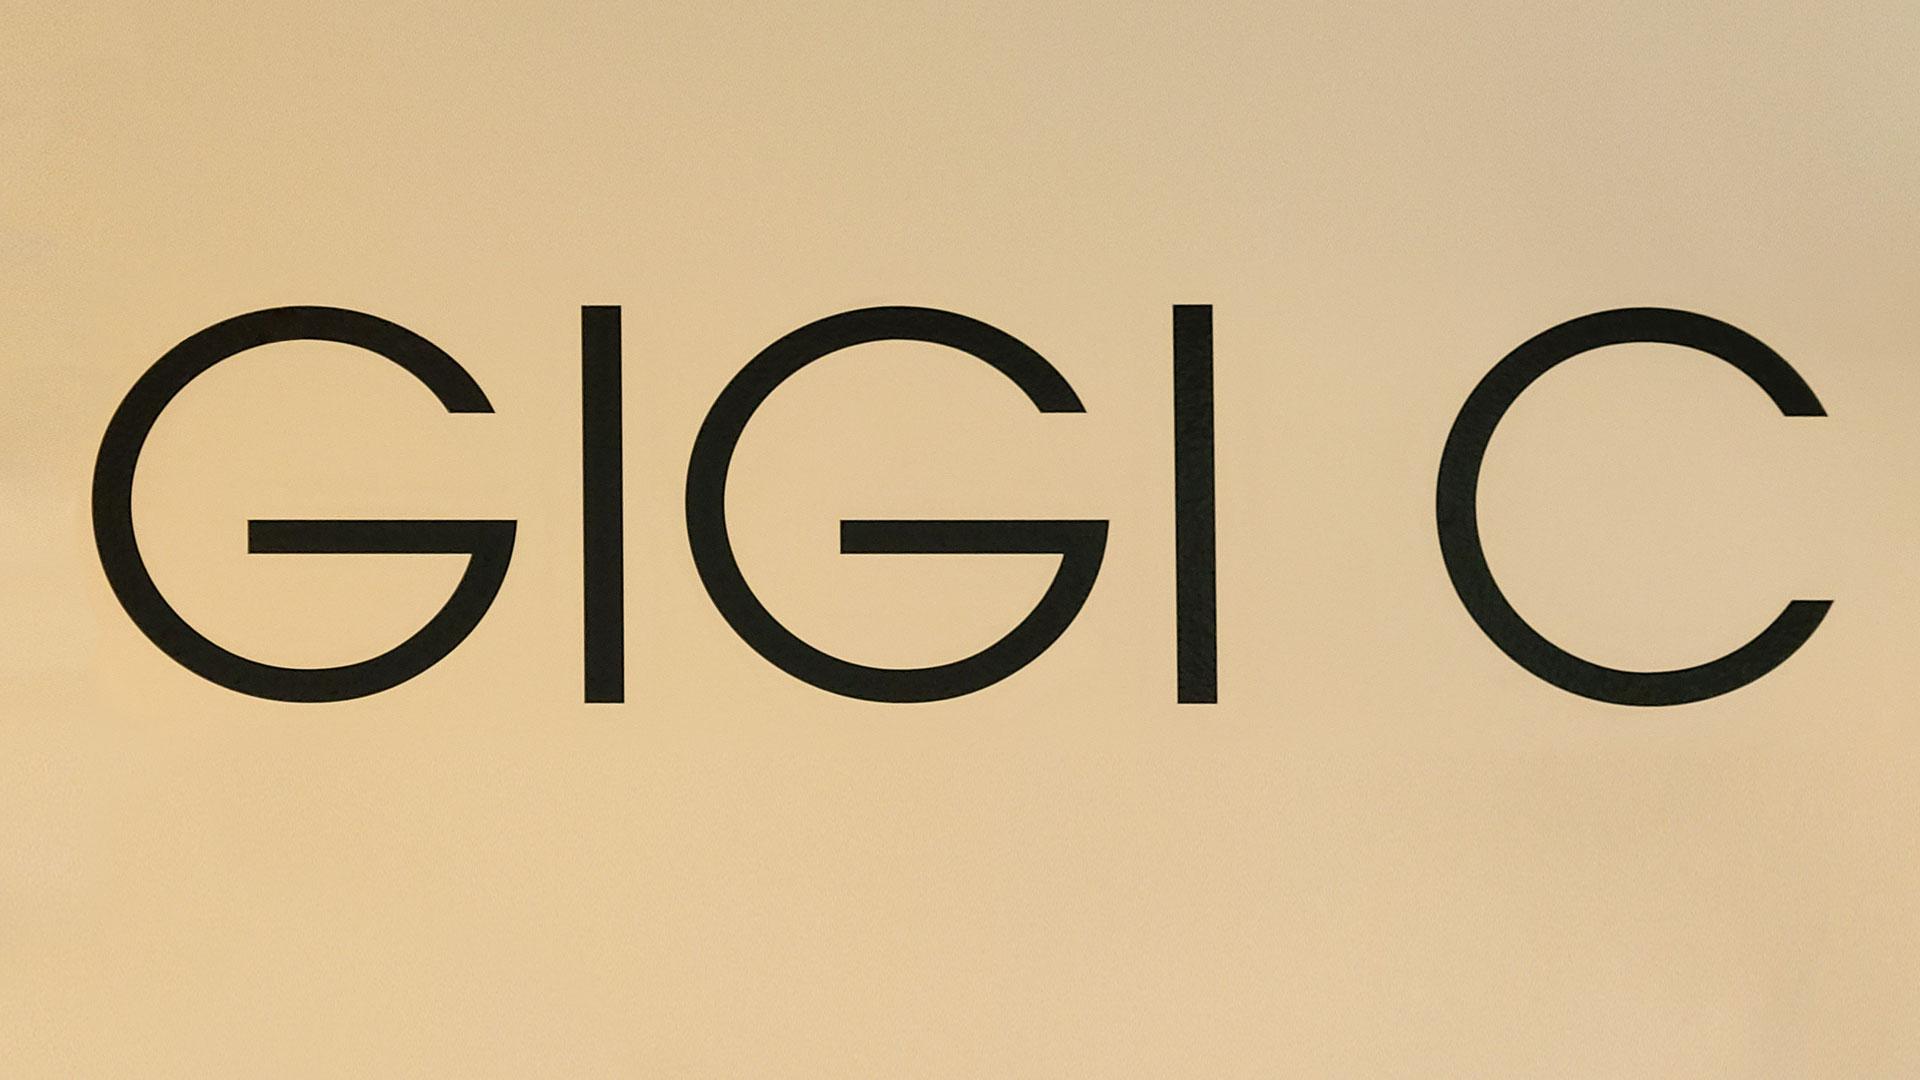 Gigi C indoor vinyl lettering